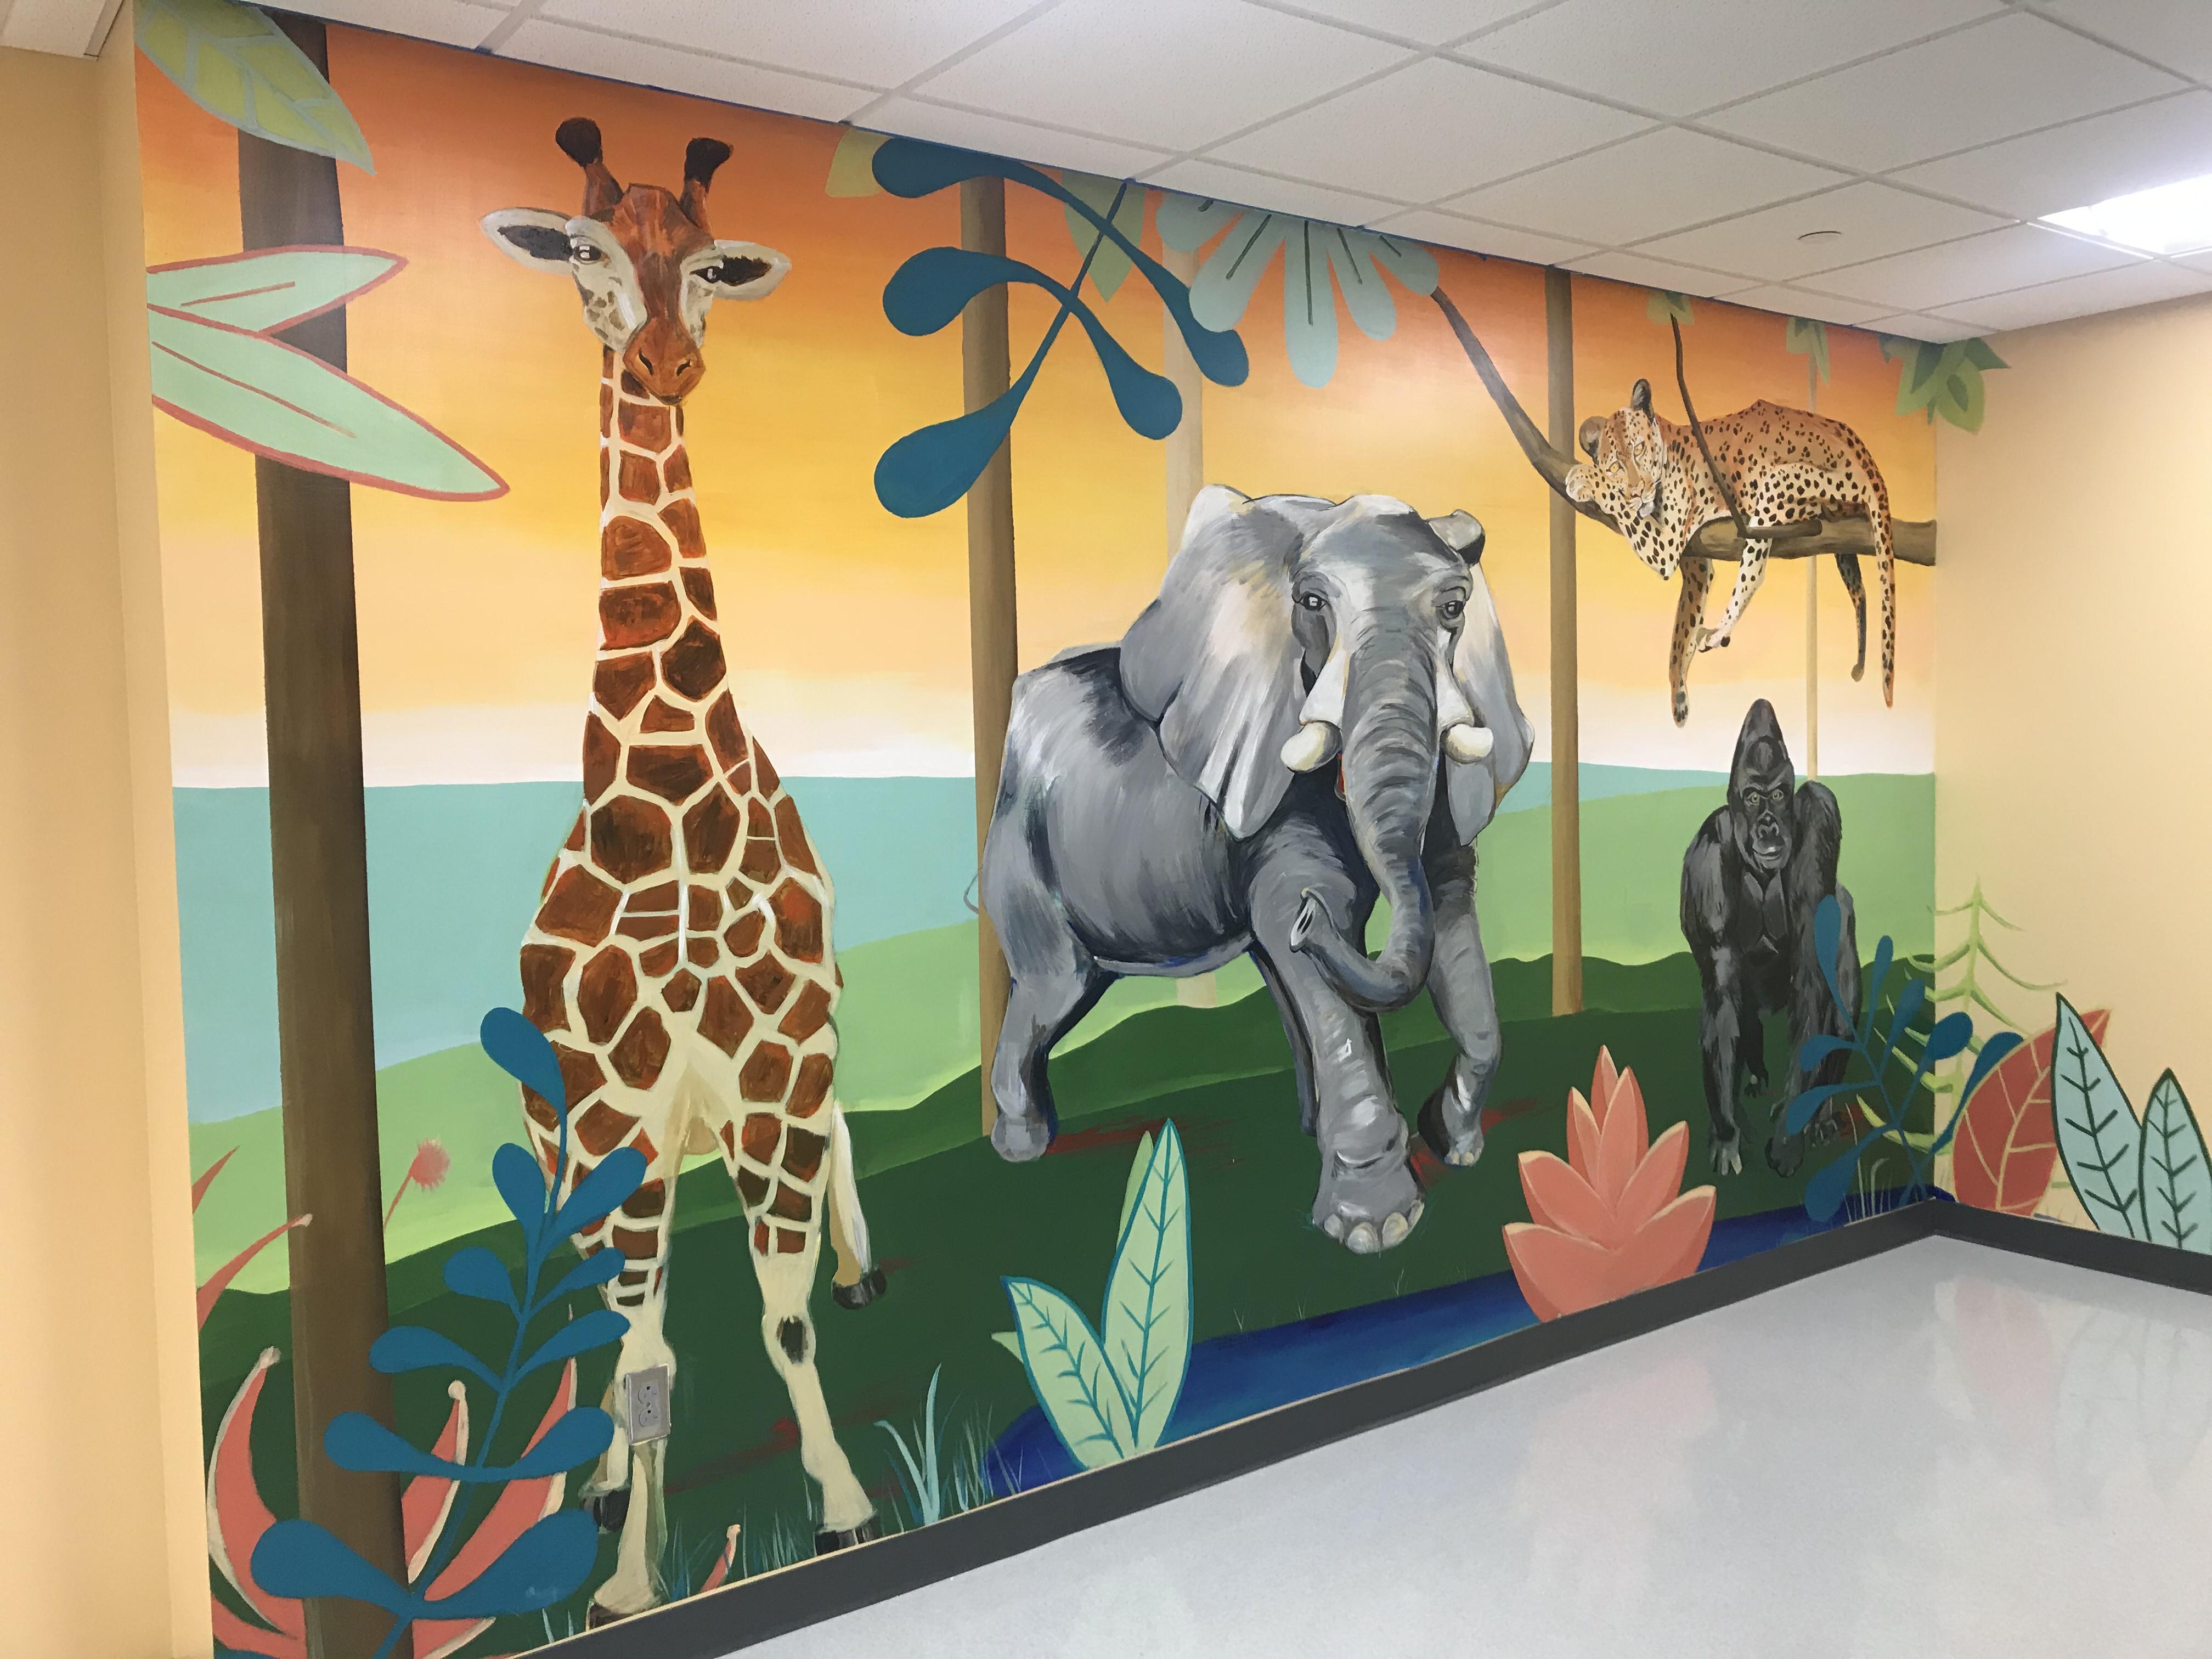 clarion mural.jpg